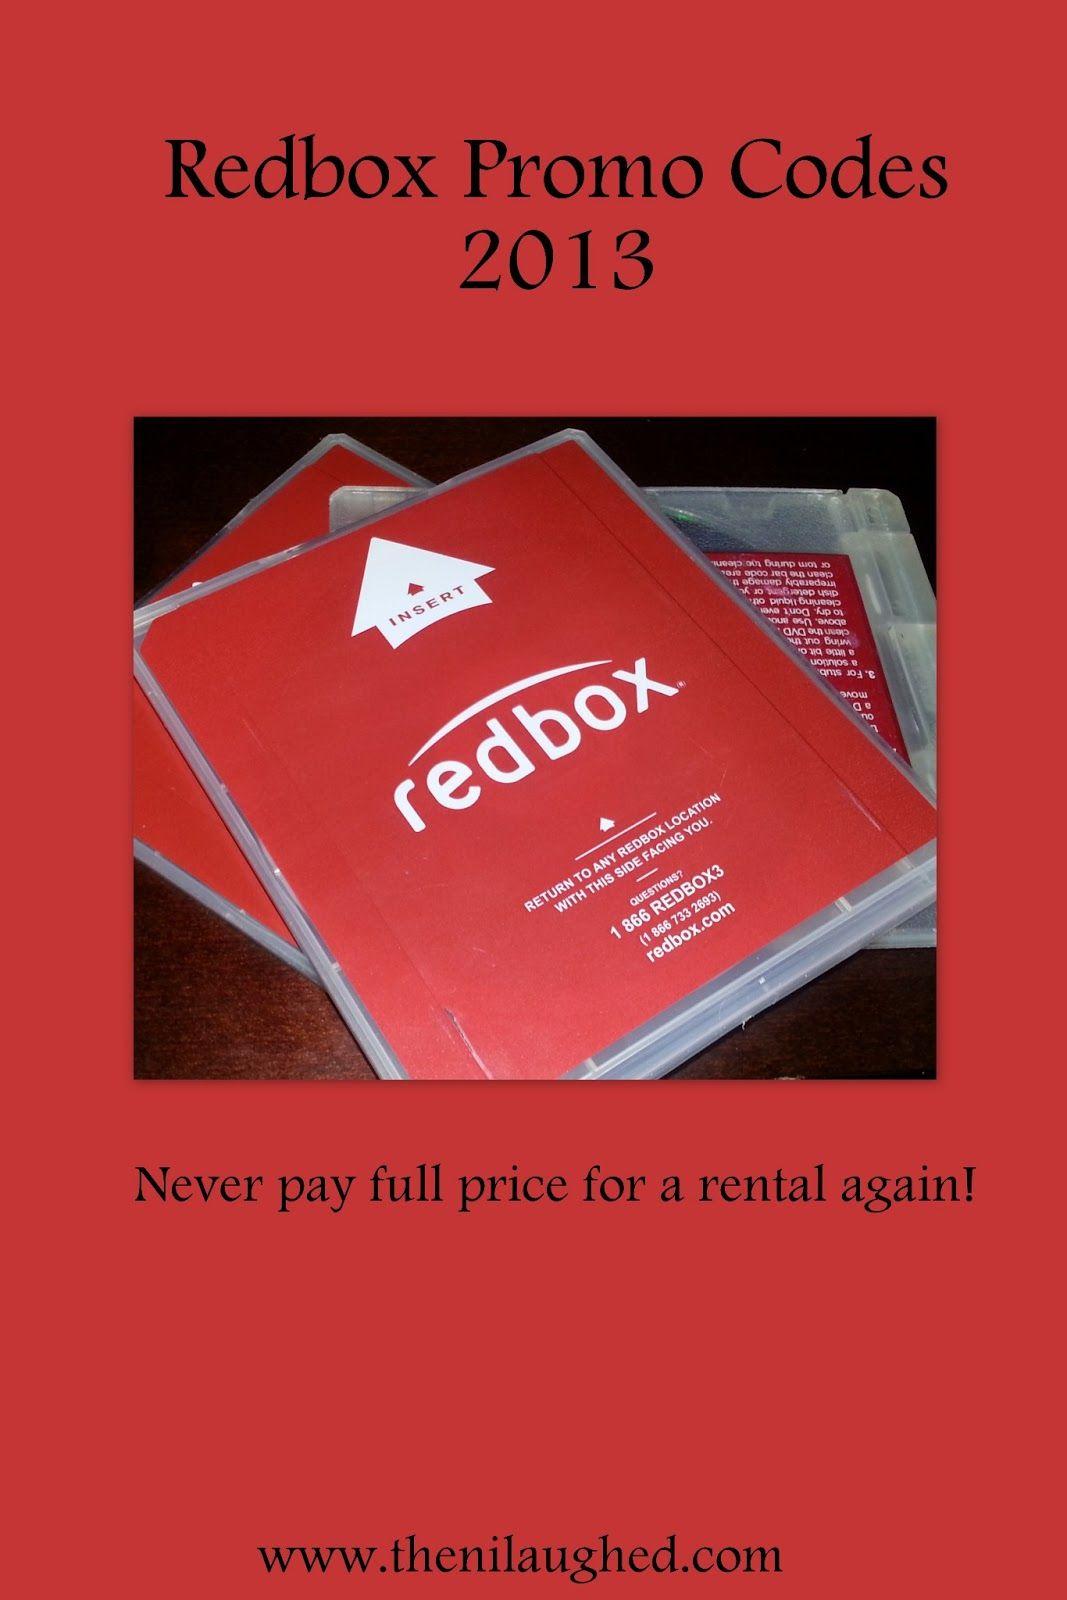 Redbox Redbox Promo Codes Helpful Hints Good To Know